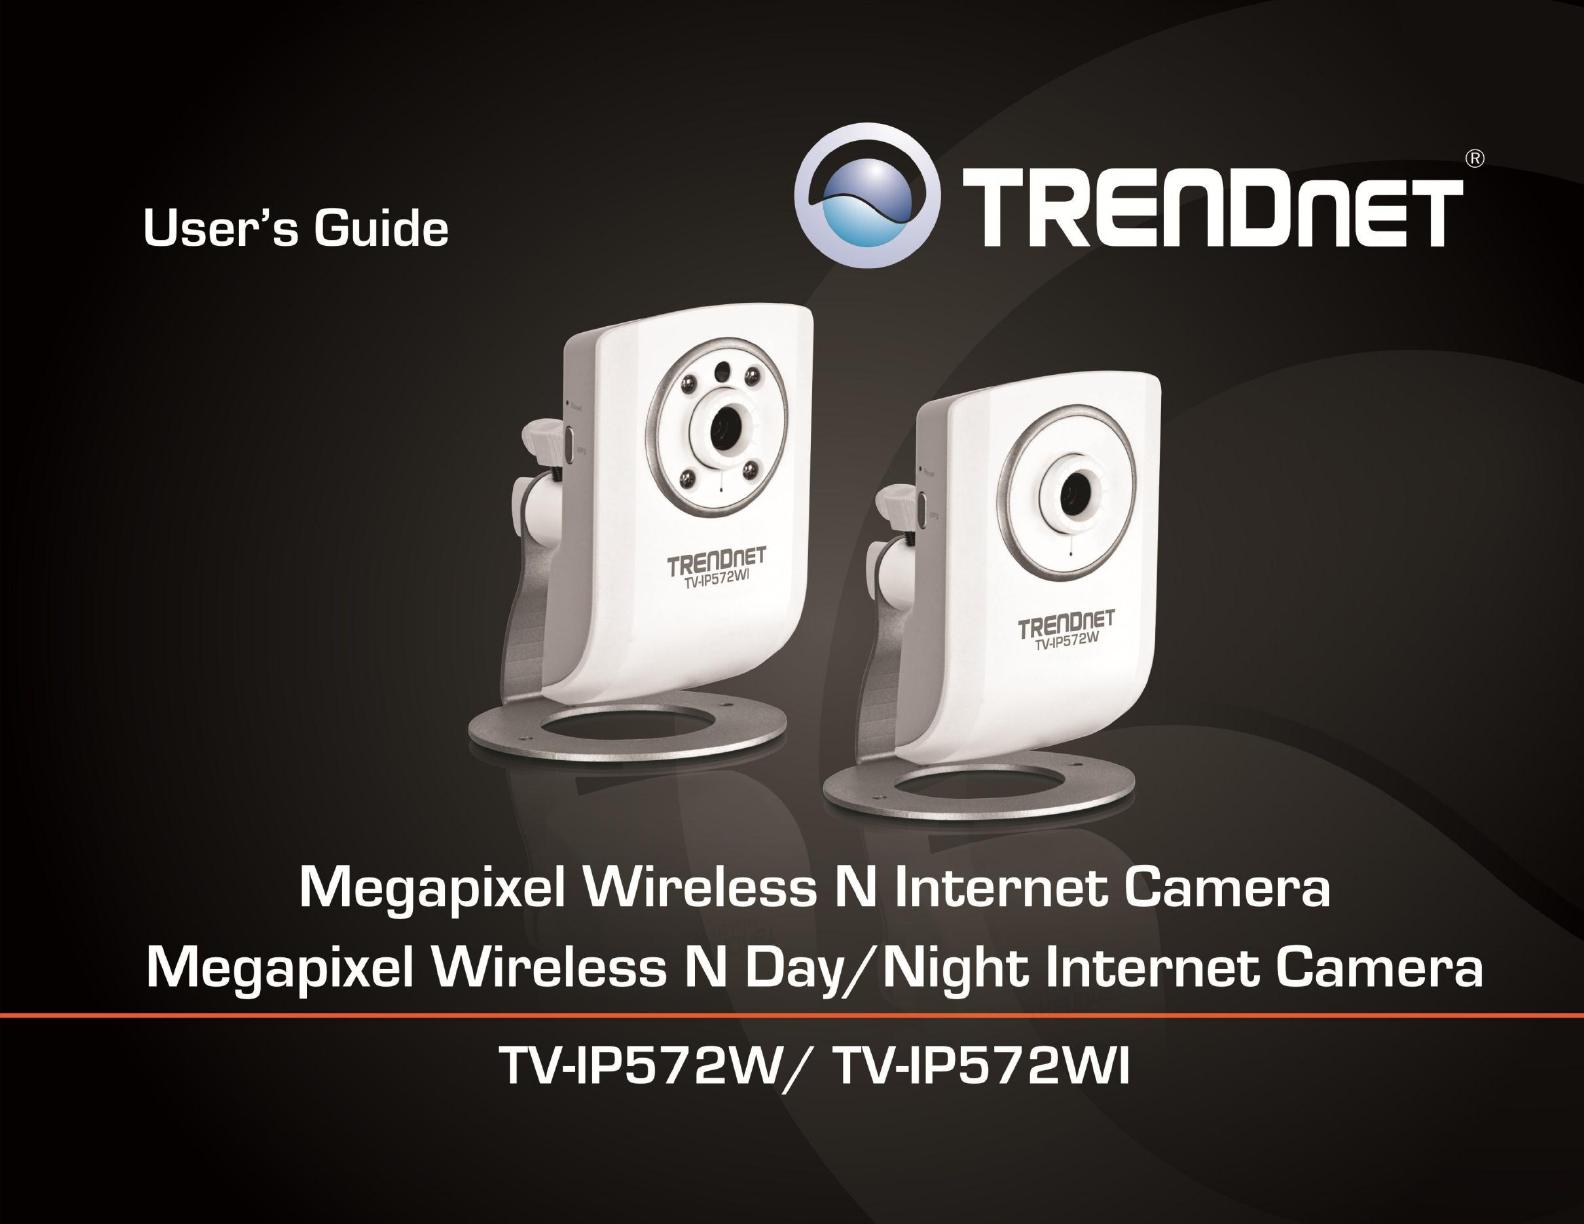 TRENDNET TV-IP572W INTERNET CAMERA DOWNLOAD DRIVERS